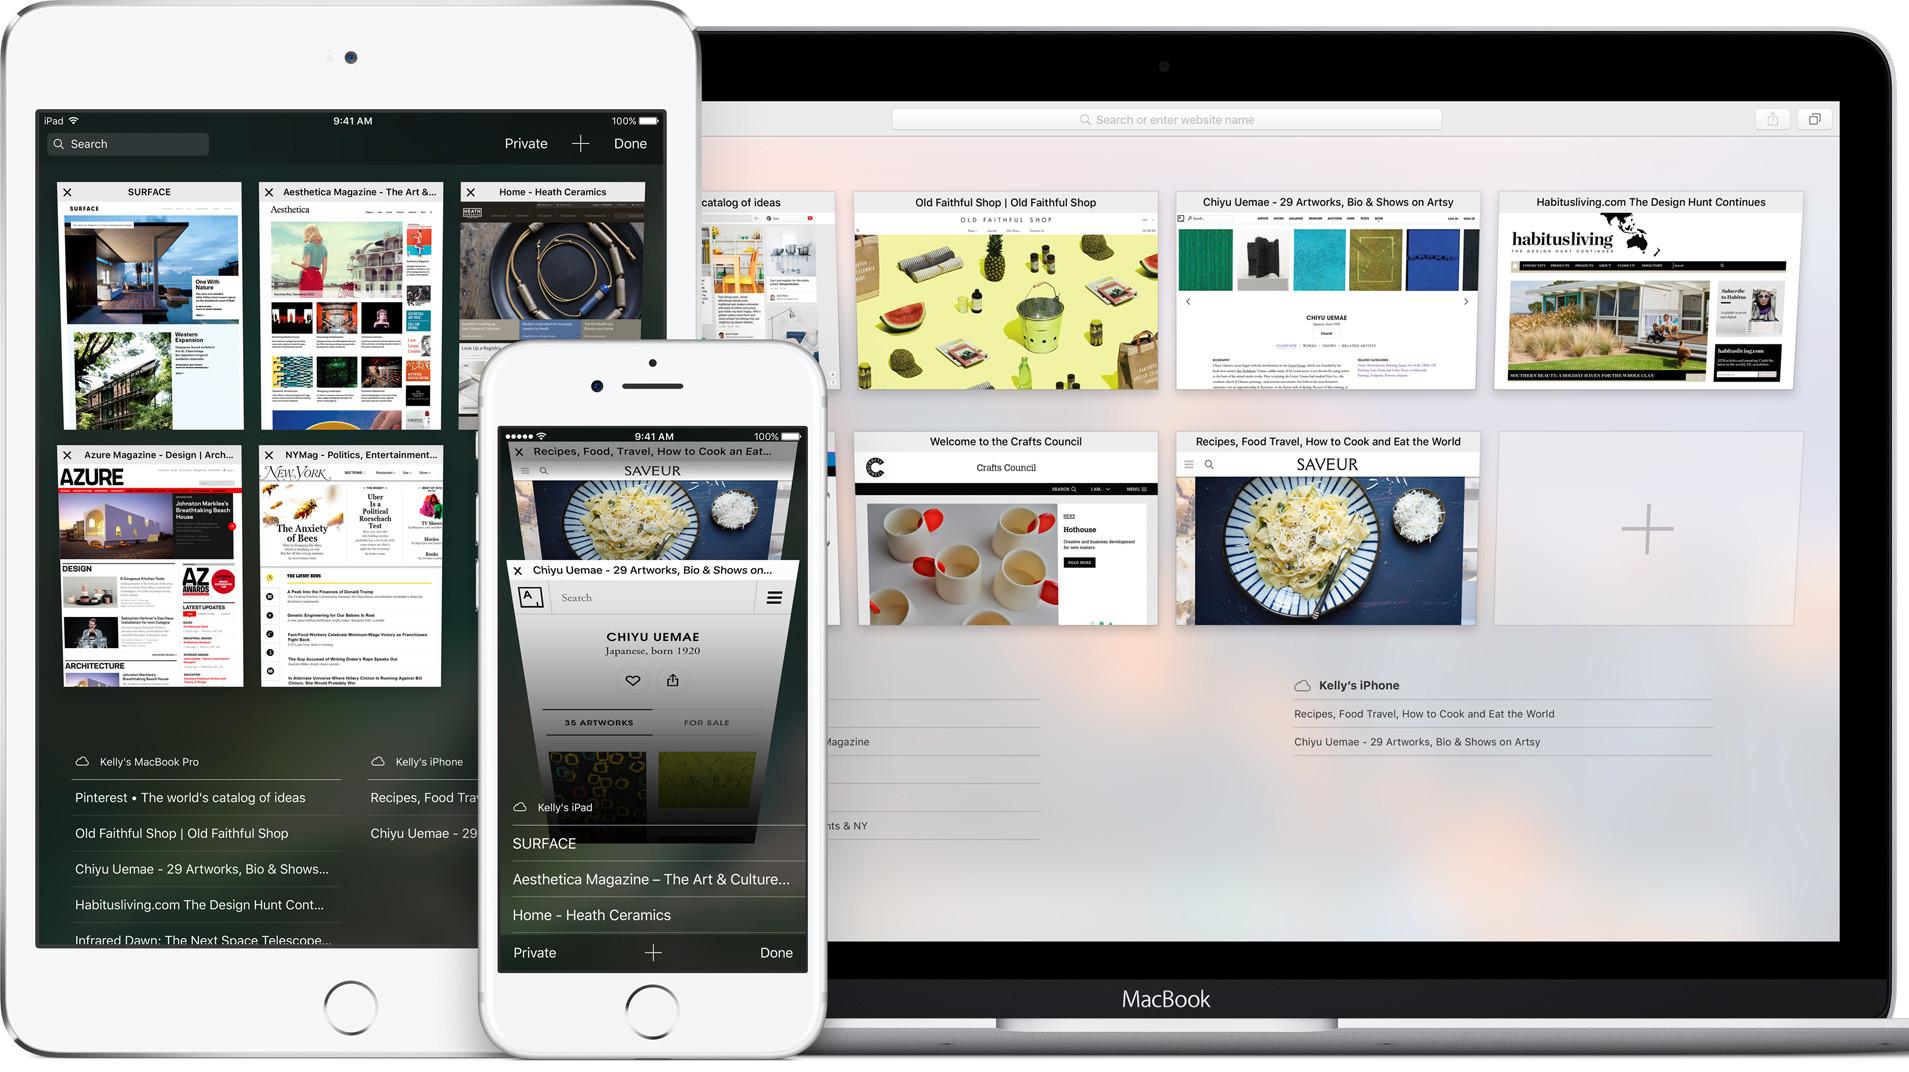 Safari auf iPhone und Mac: Apples neue Login-Automatik kann Probleme bereiten